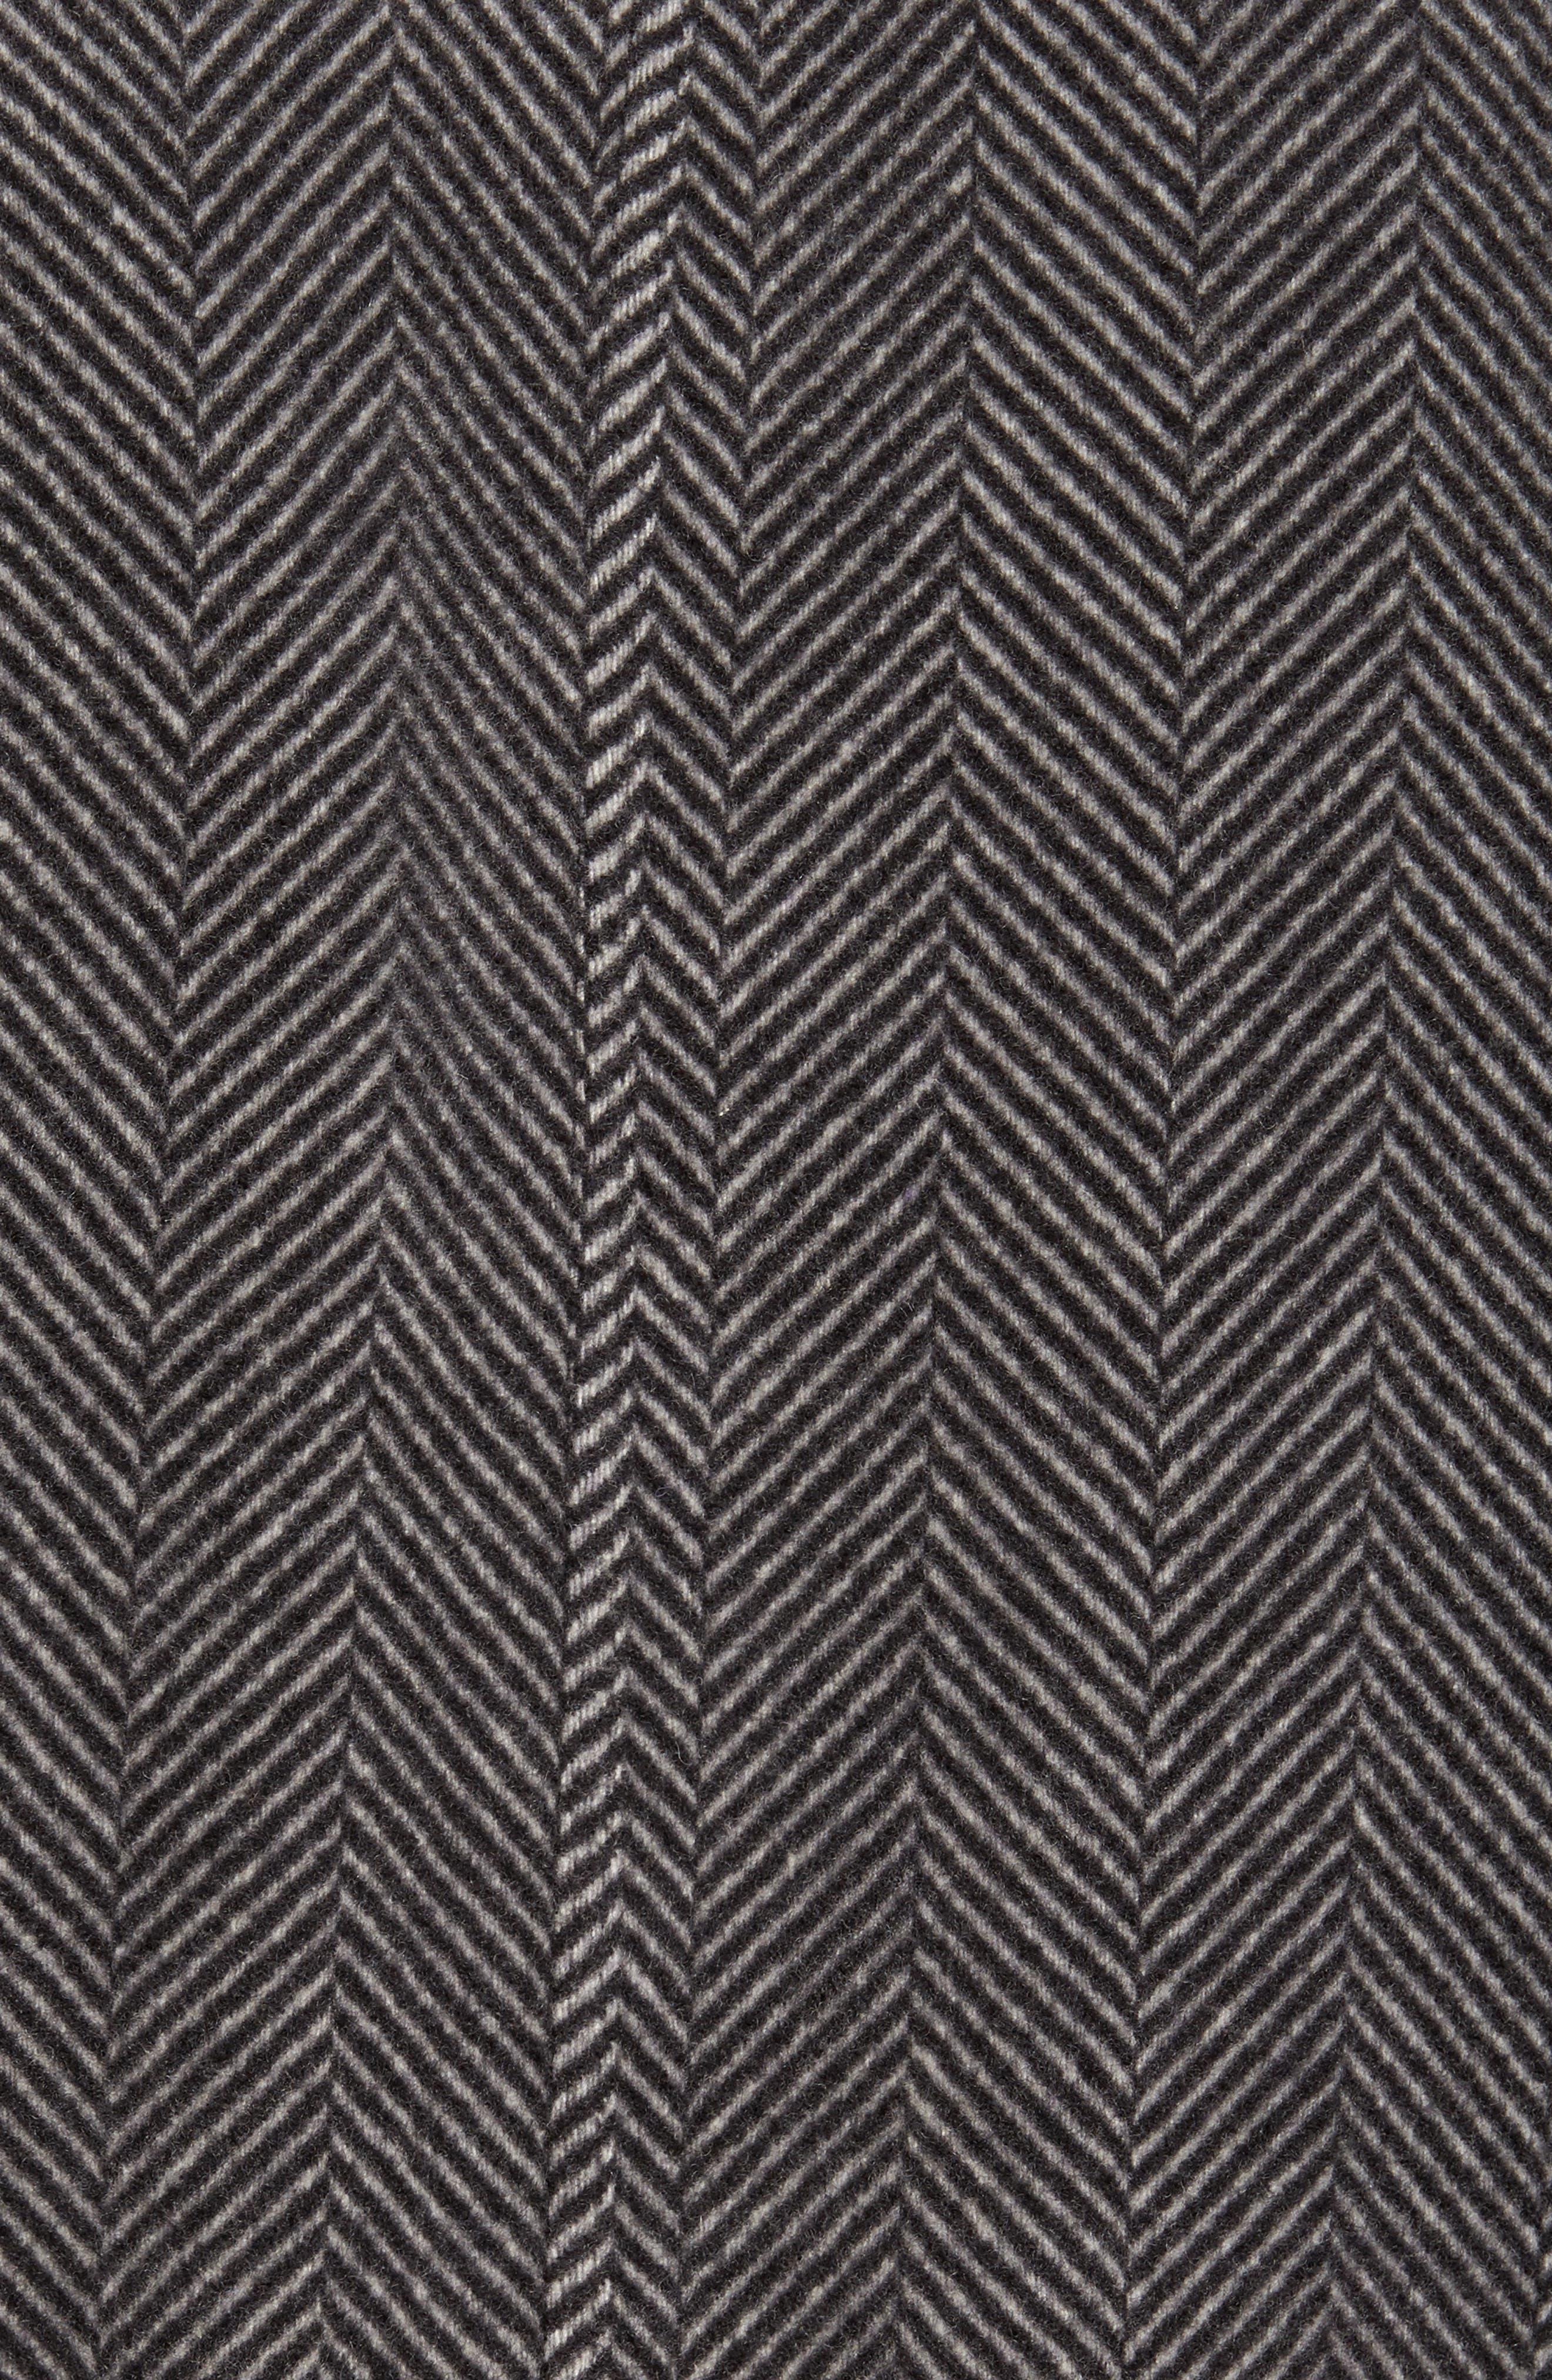 Anchor Line Herringbone Wool Blend Shirt Jacket,                             Alternate thumbnail 6, color,